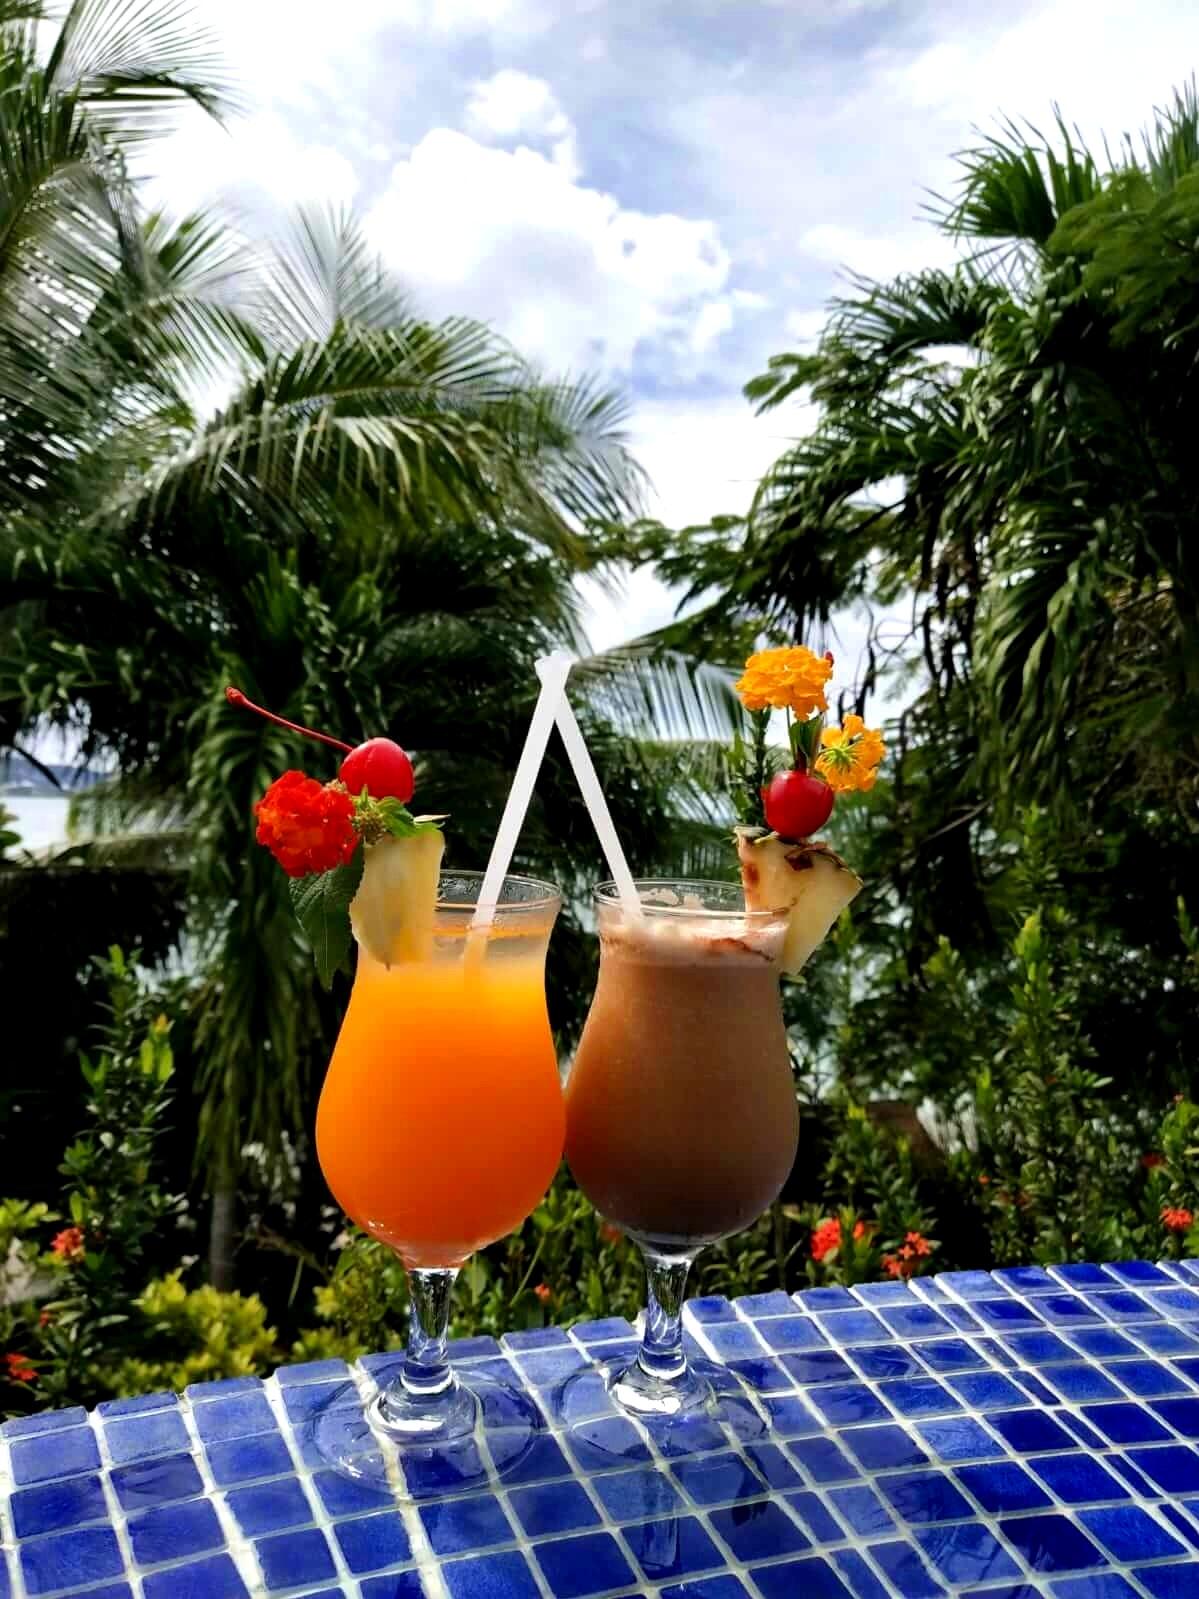 Calabash Cove St Lucia cocktails